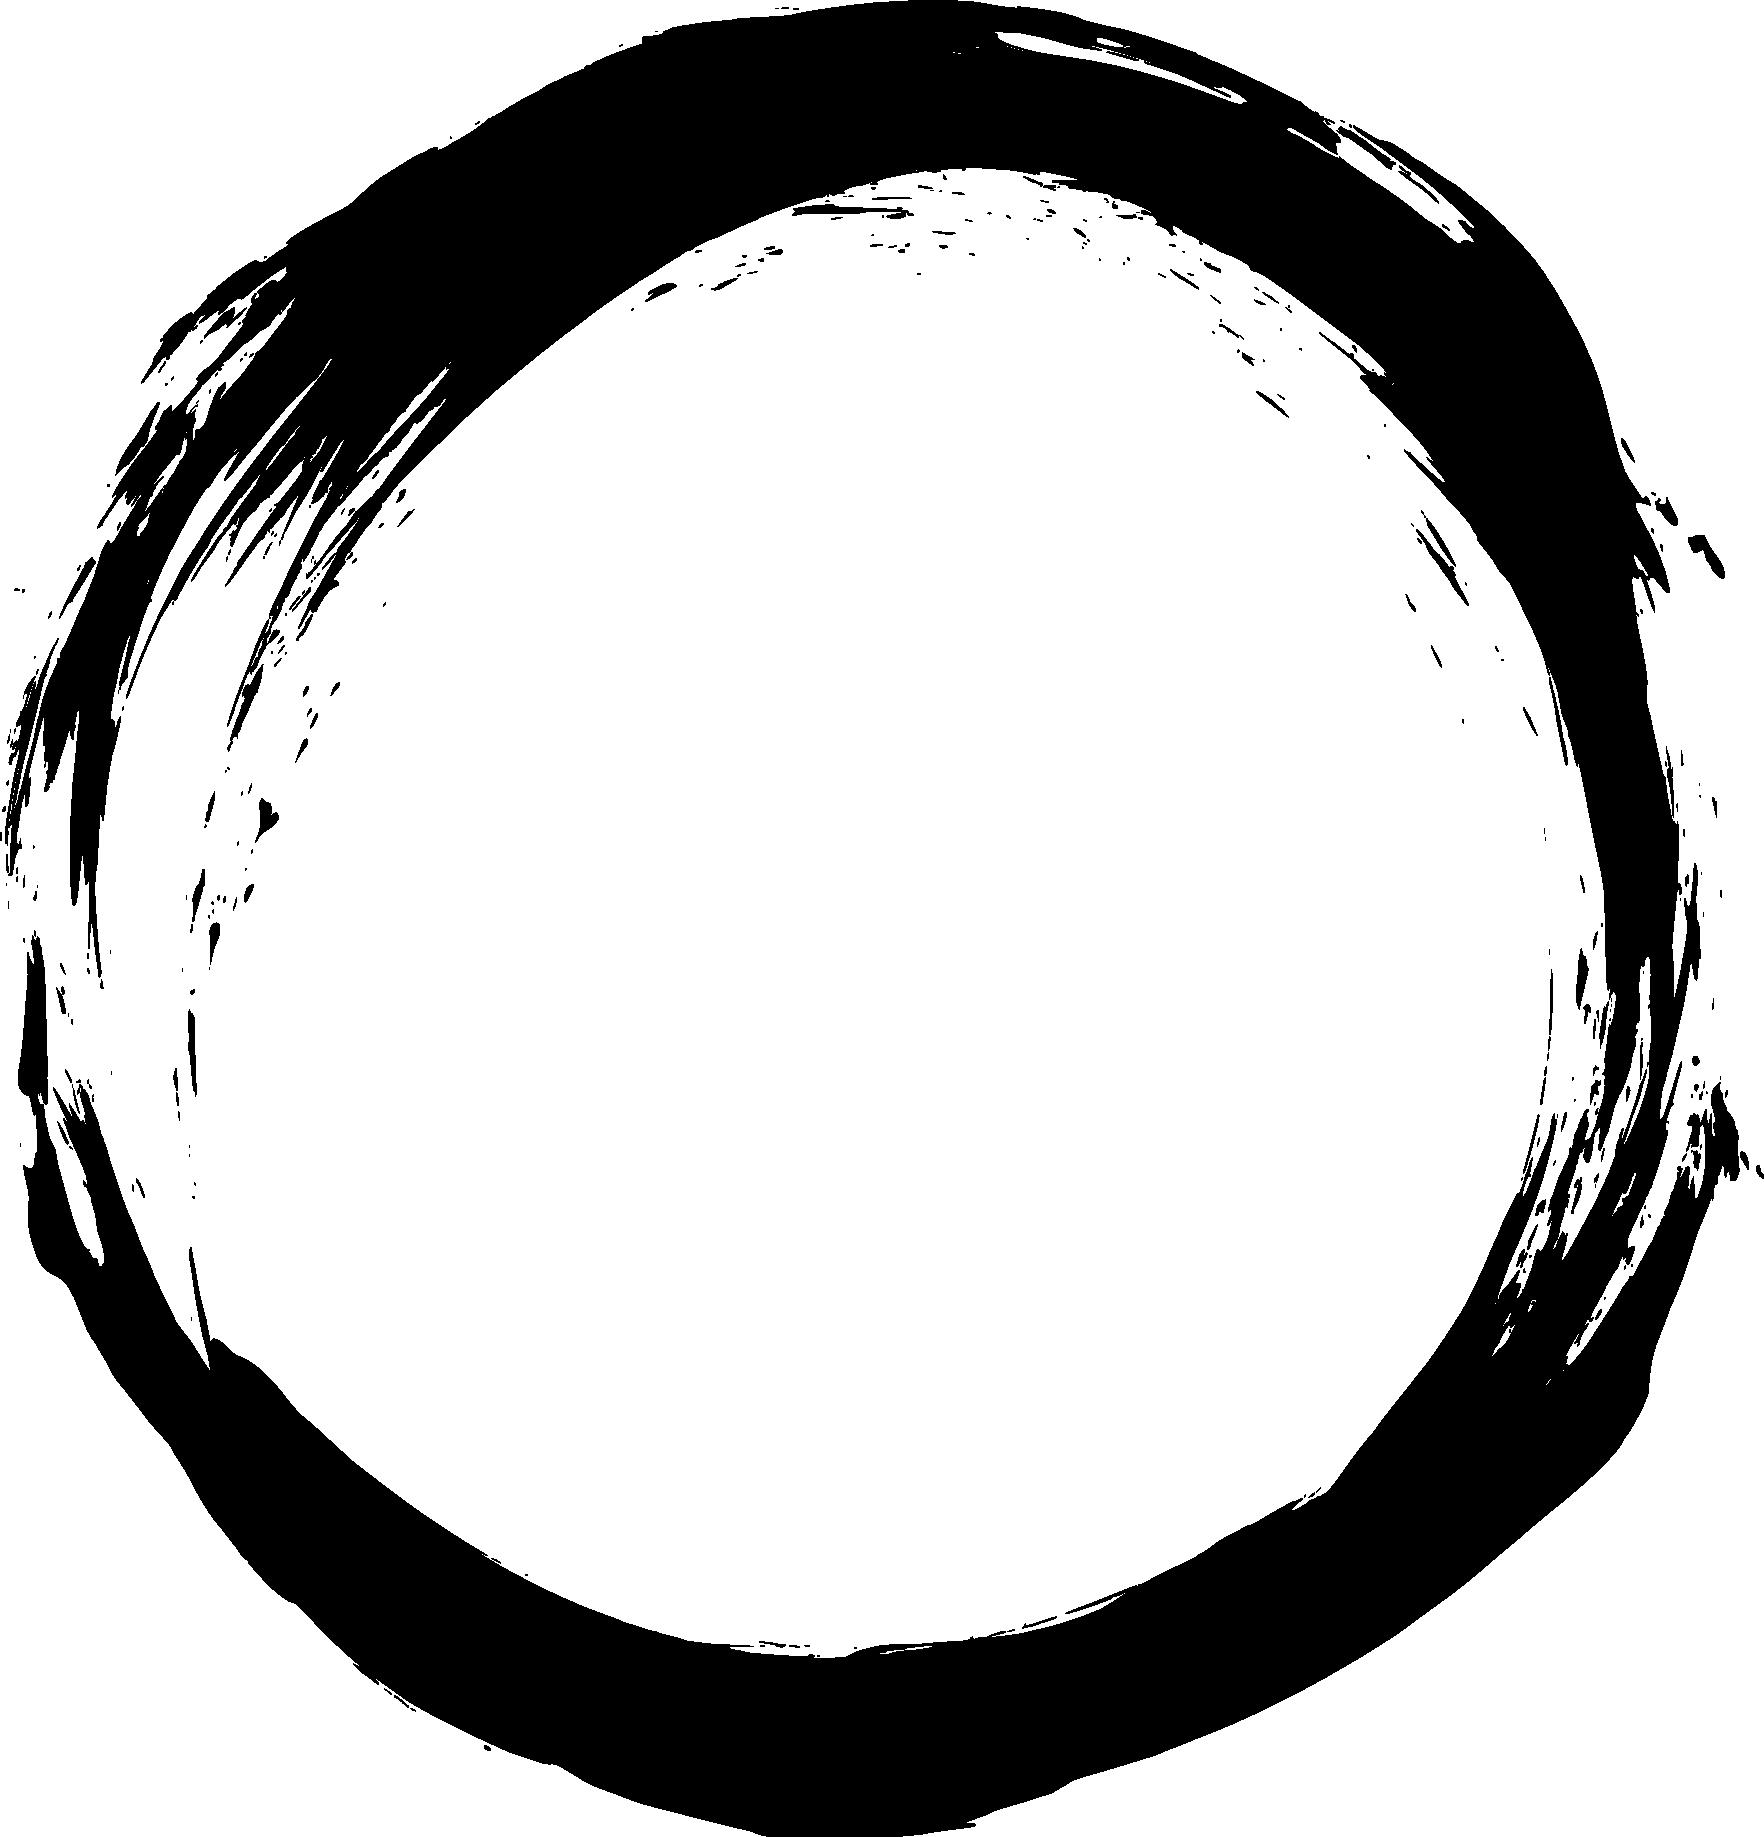 6 Grunge Circle Frame Png Transparent Onlygfx Com